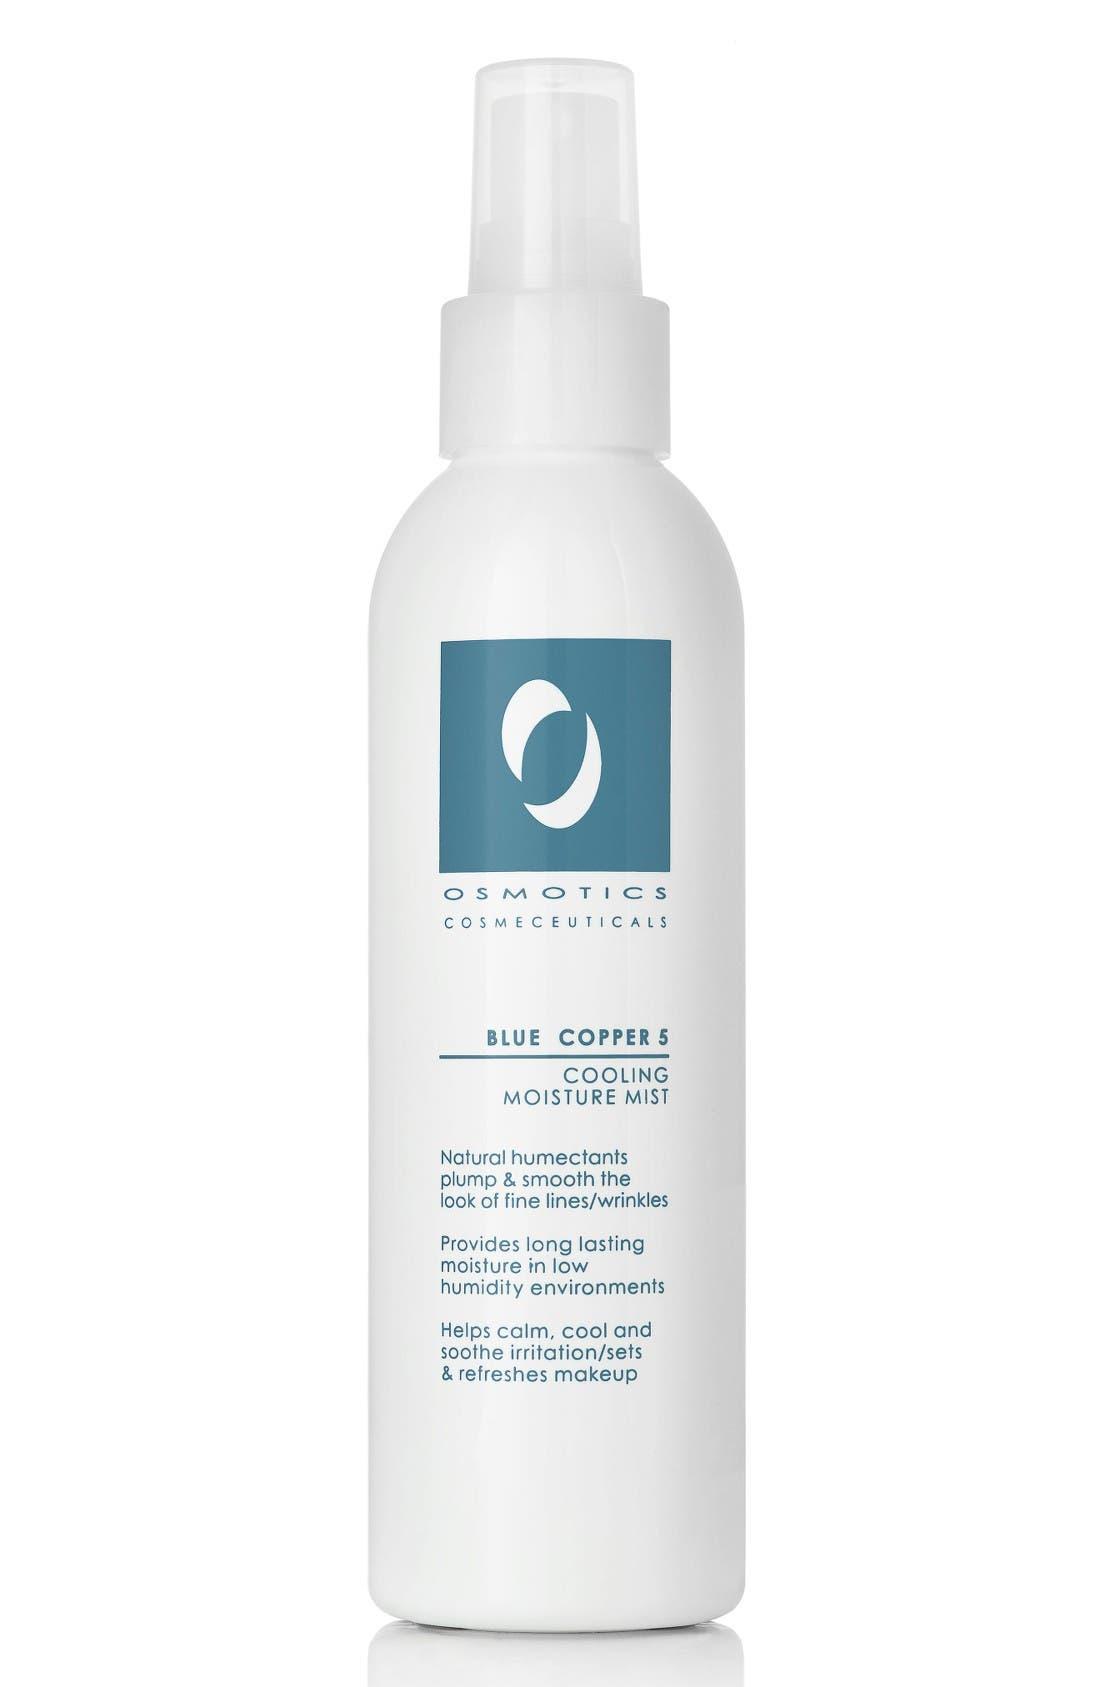 Main Image - Osmotics Cosmeceuticals Blue Copper 5 Cooling Moisture Mist